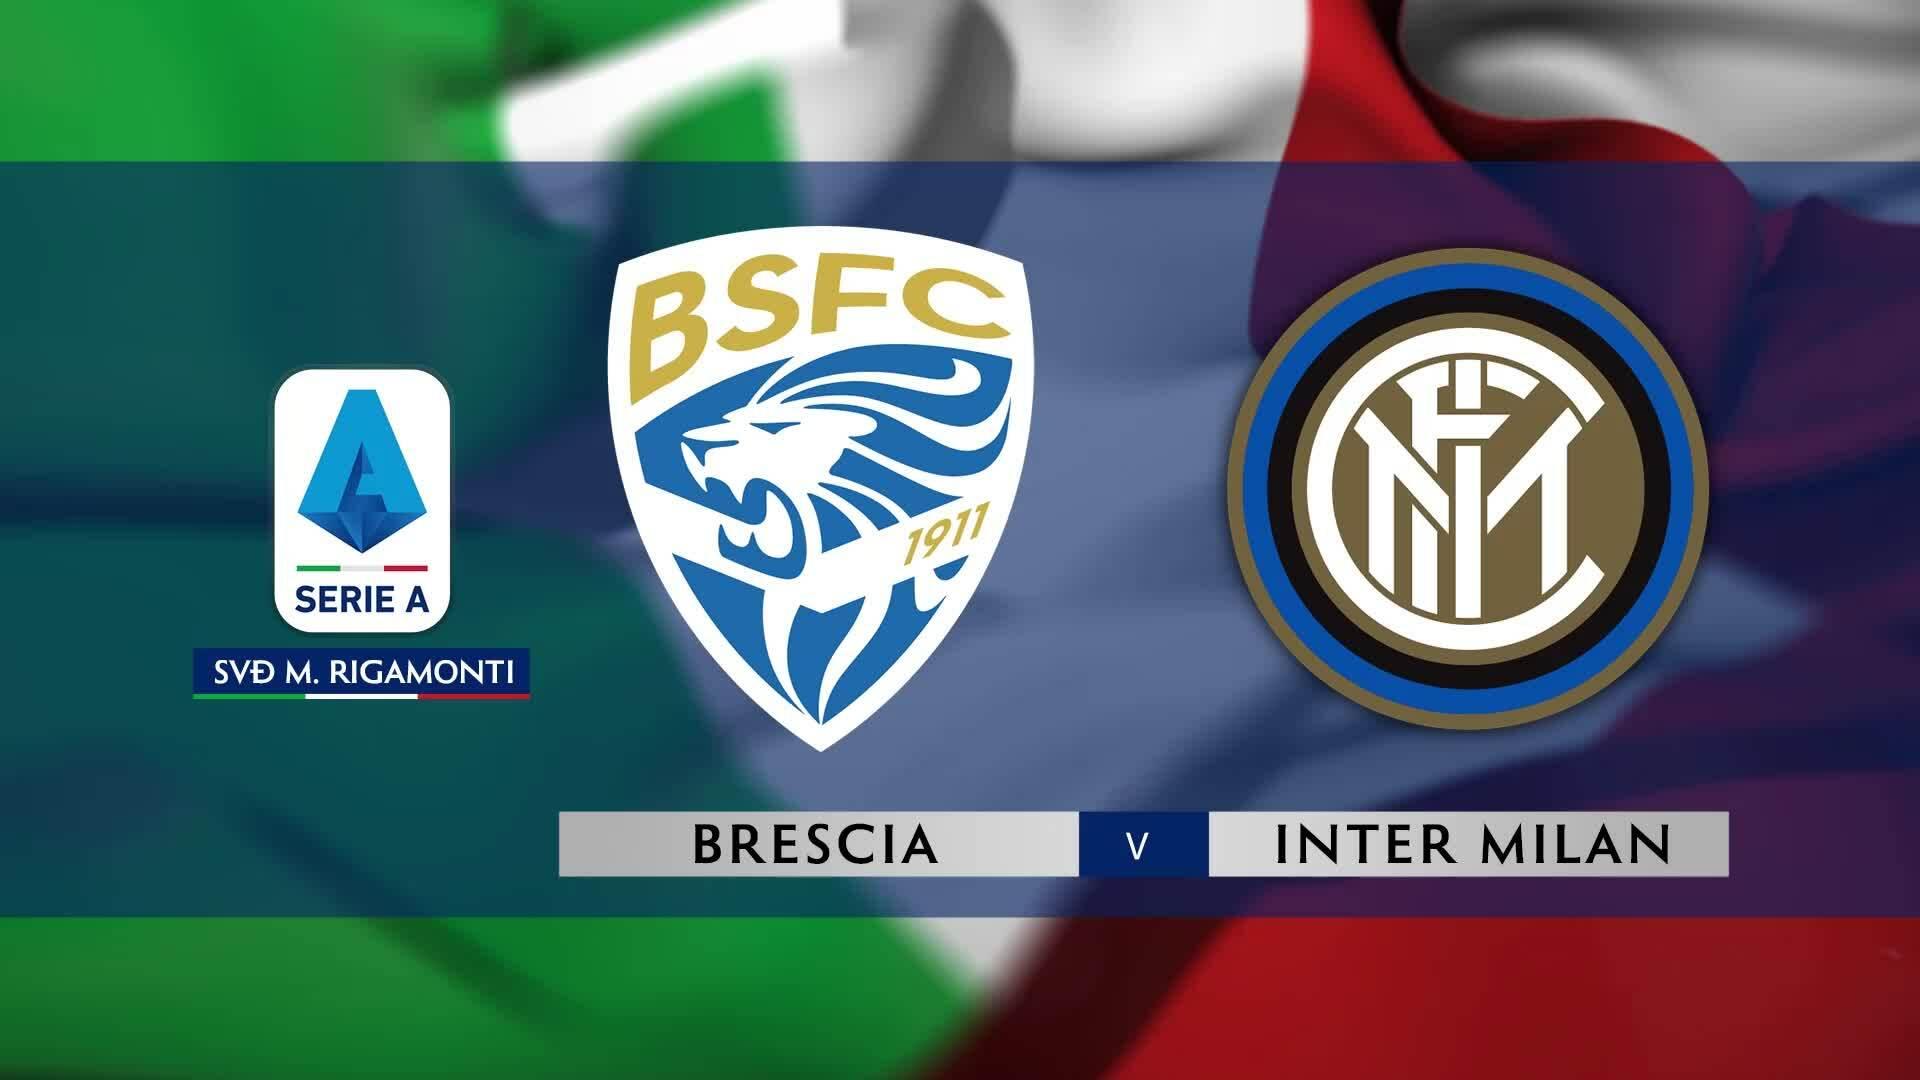 Brescia 1-2 Inter Milan